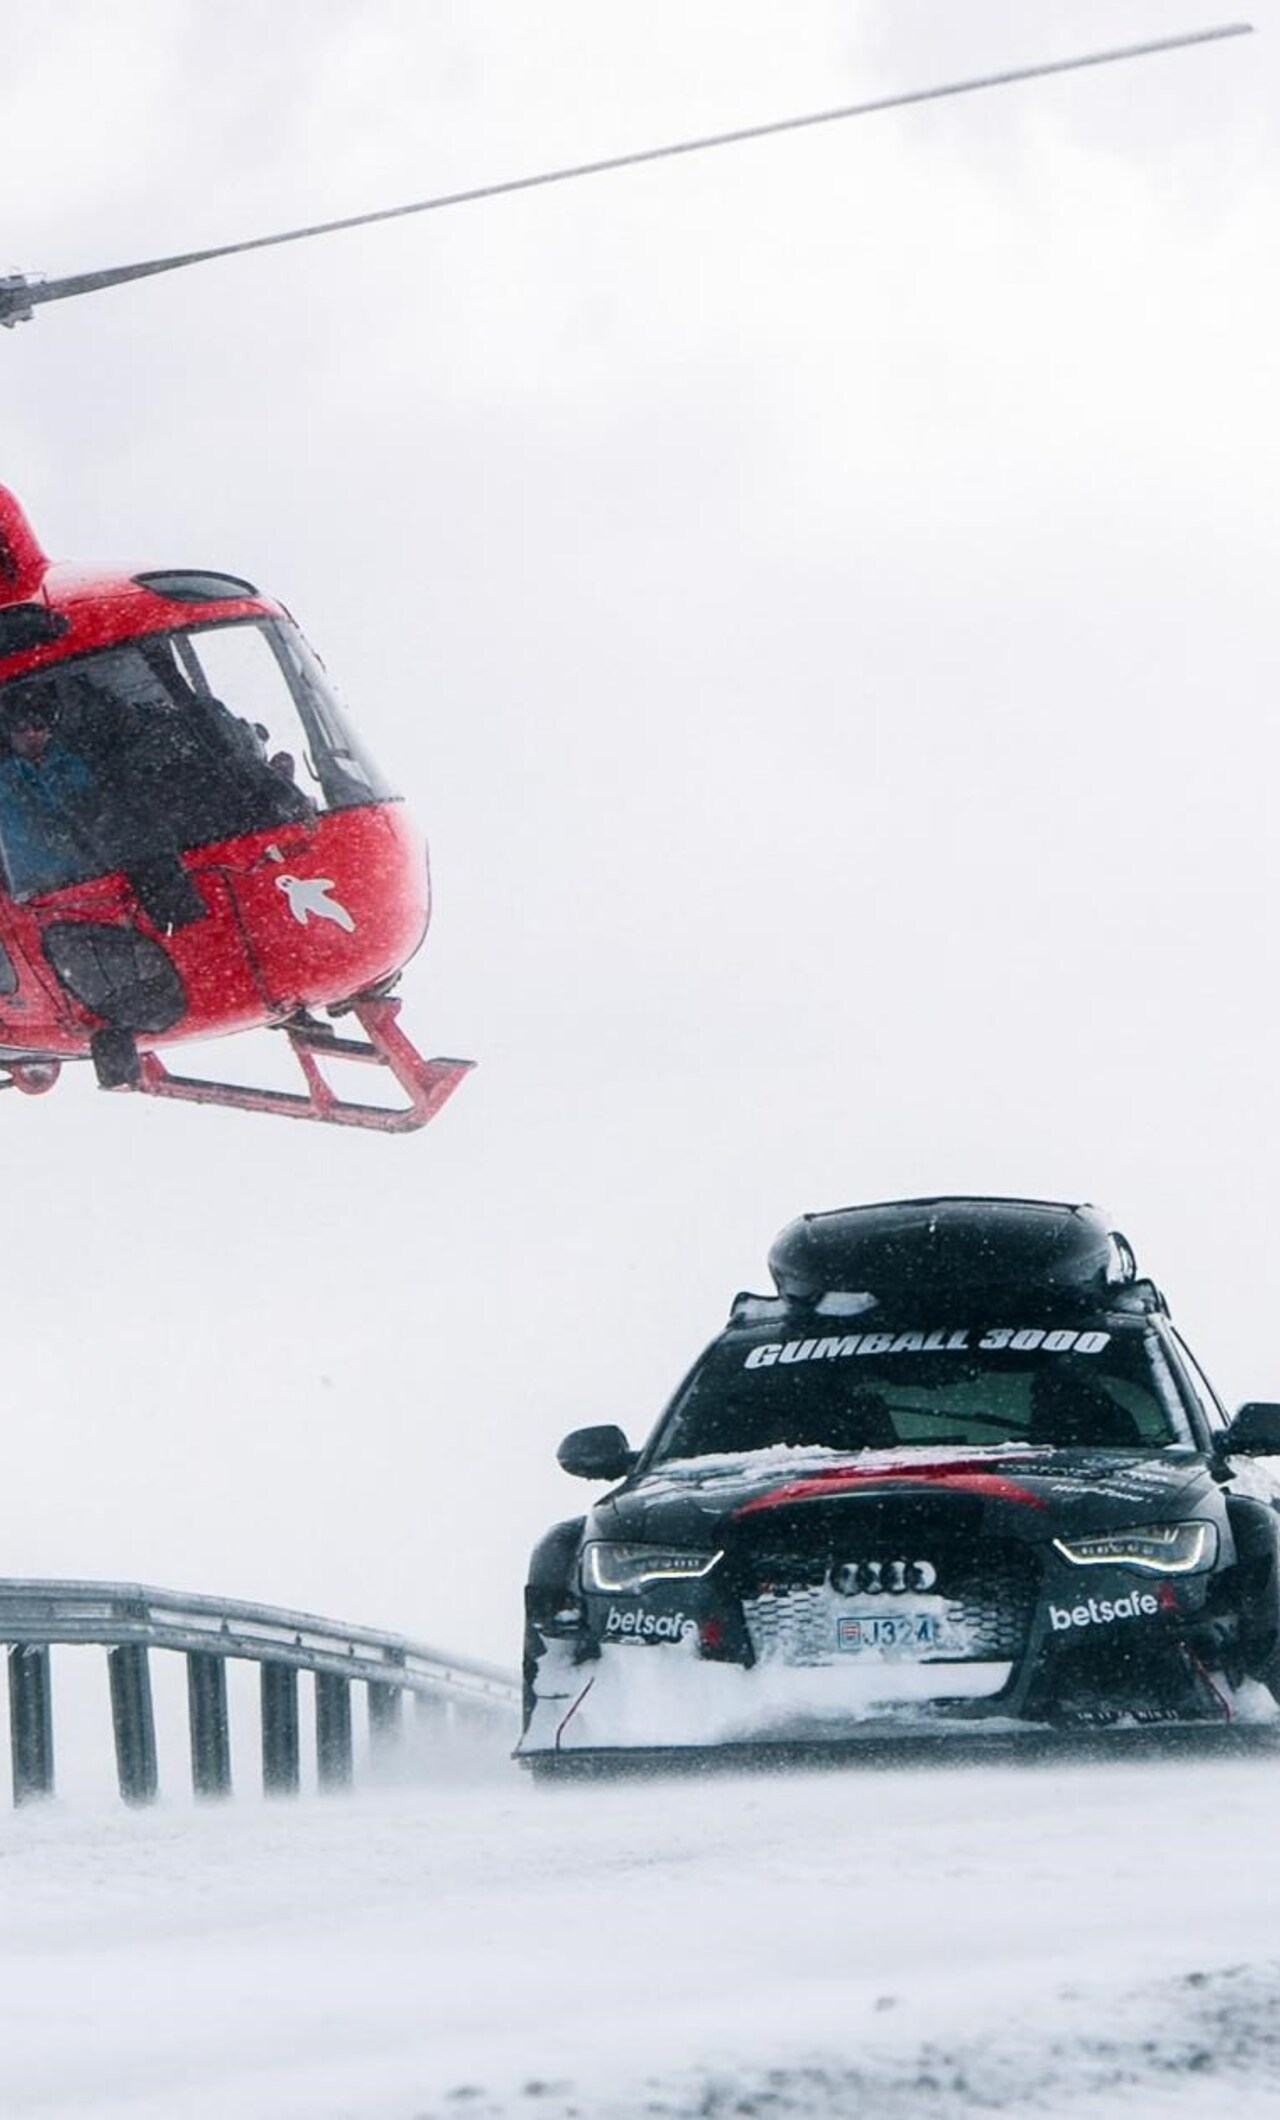 Audi Rs6 Snow Racing Image